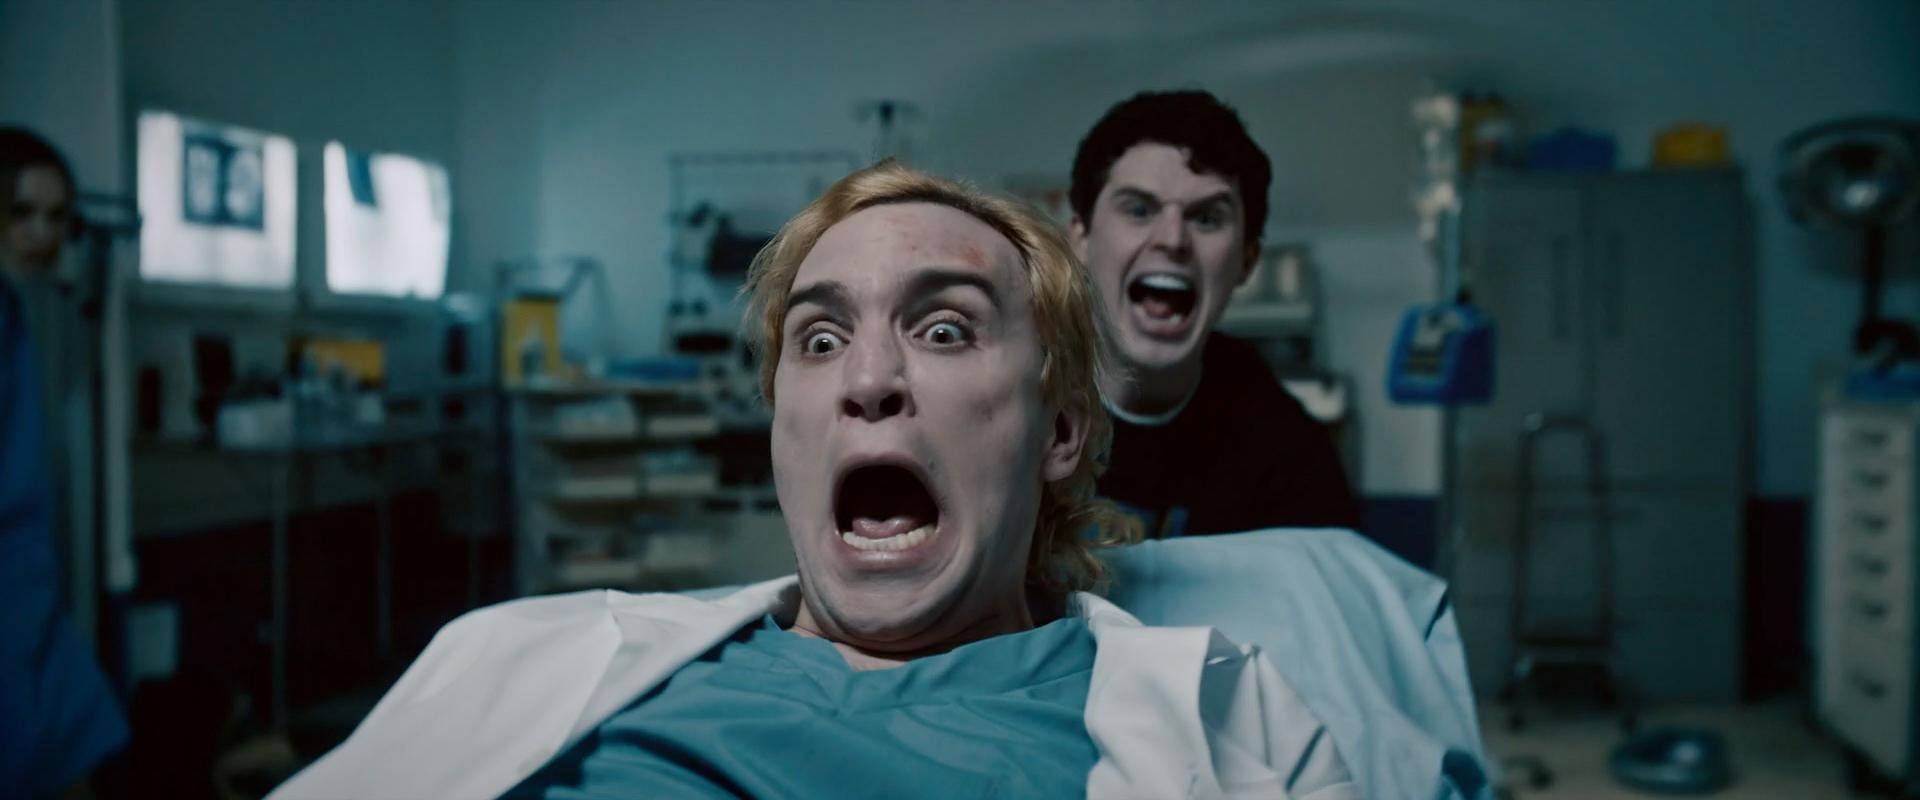 Vicious Fun image film